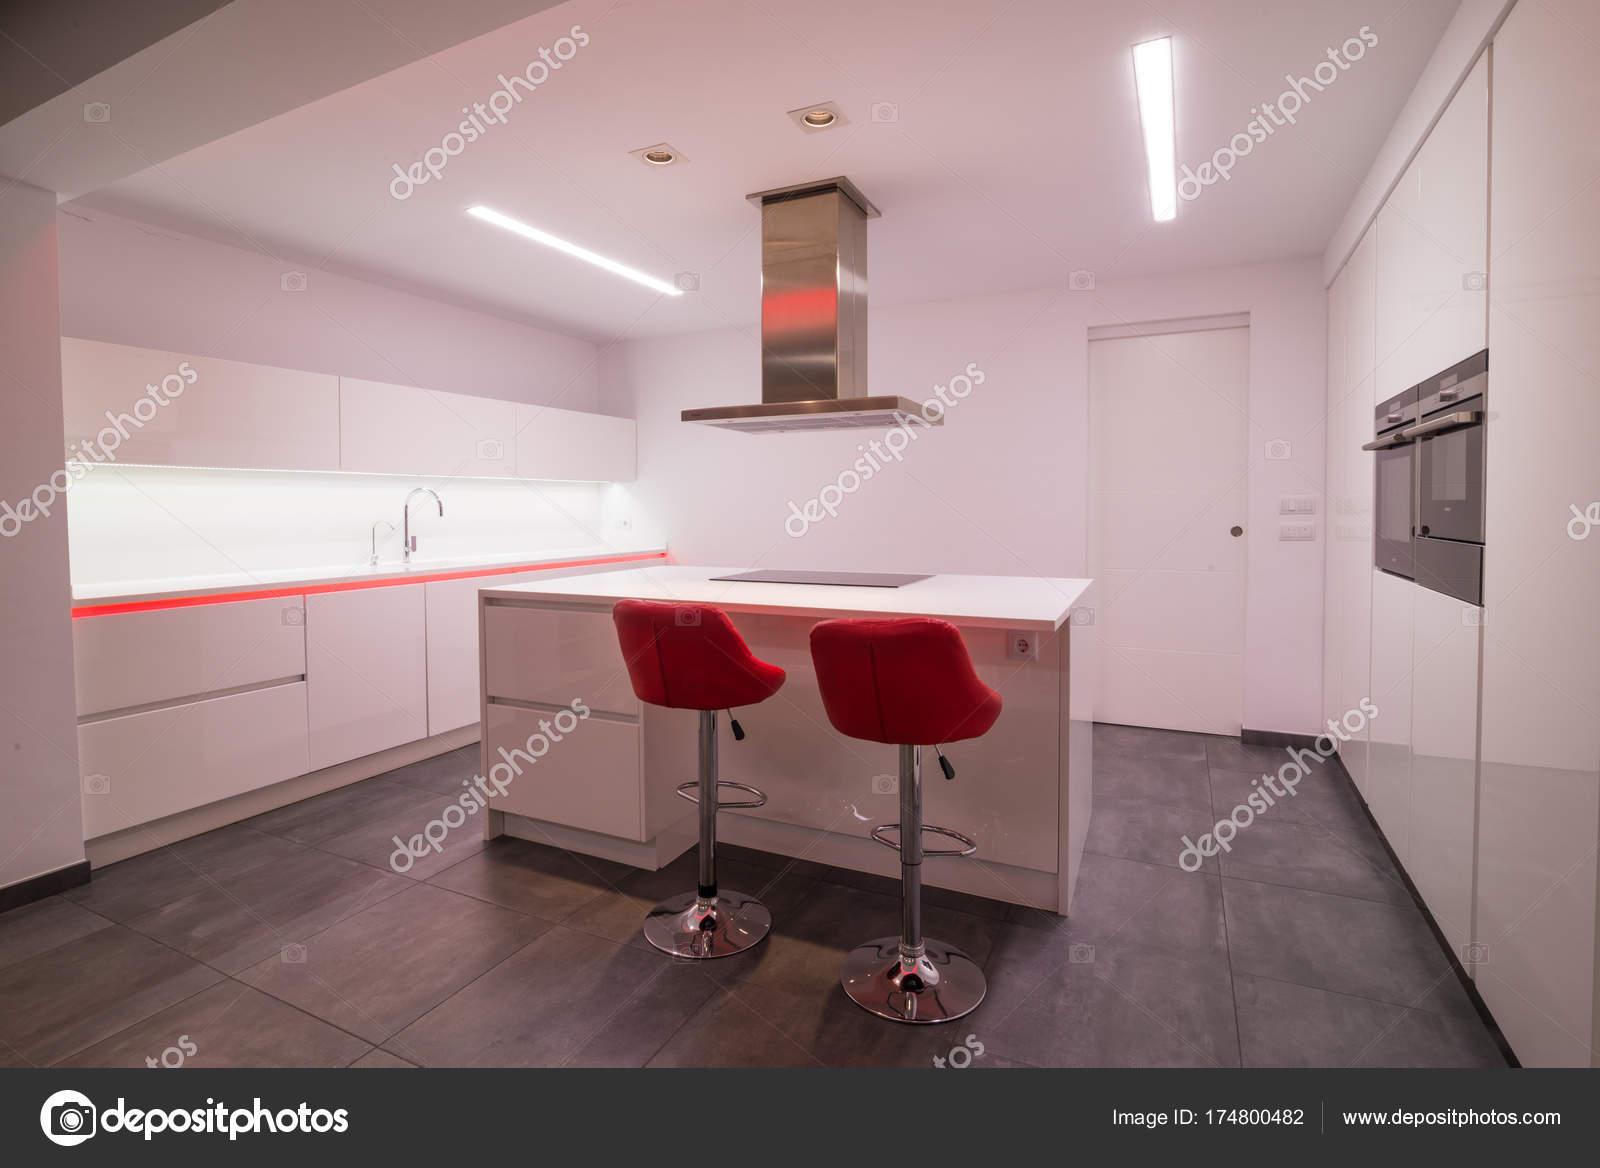 Interior Da Cozinha Moderna Stock Photo Olafspeier 174800482